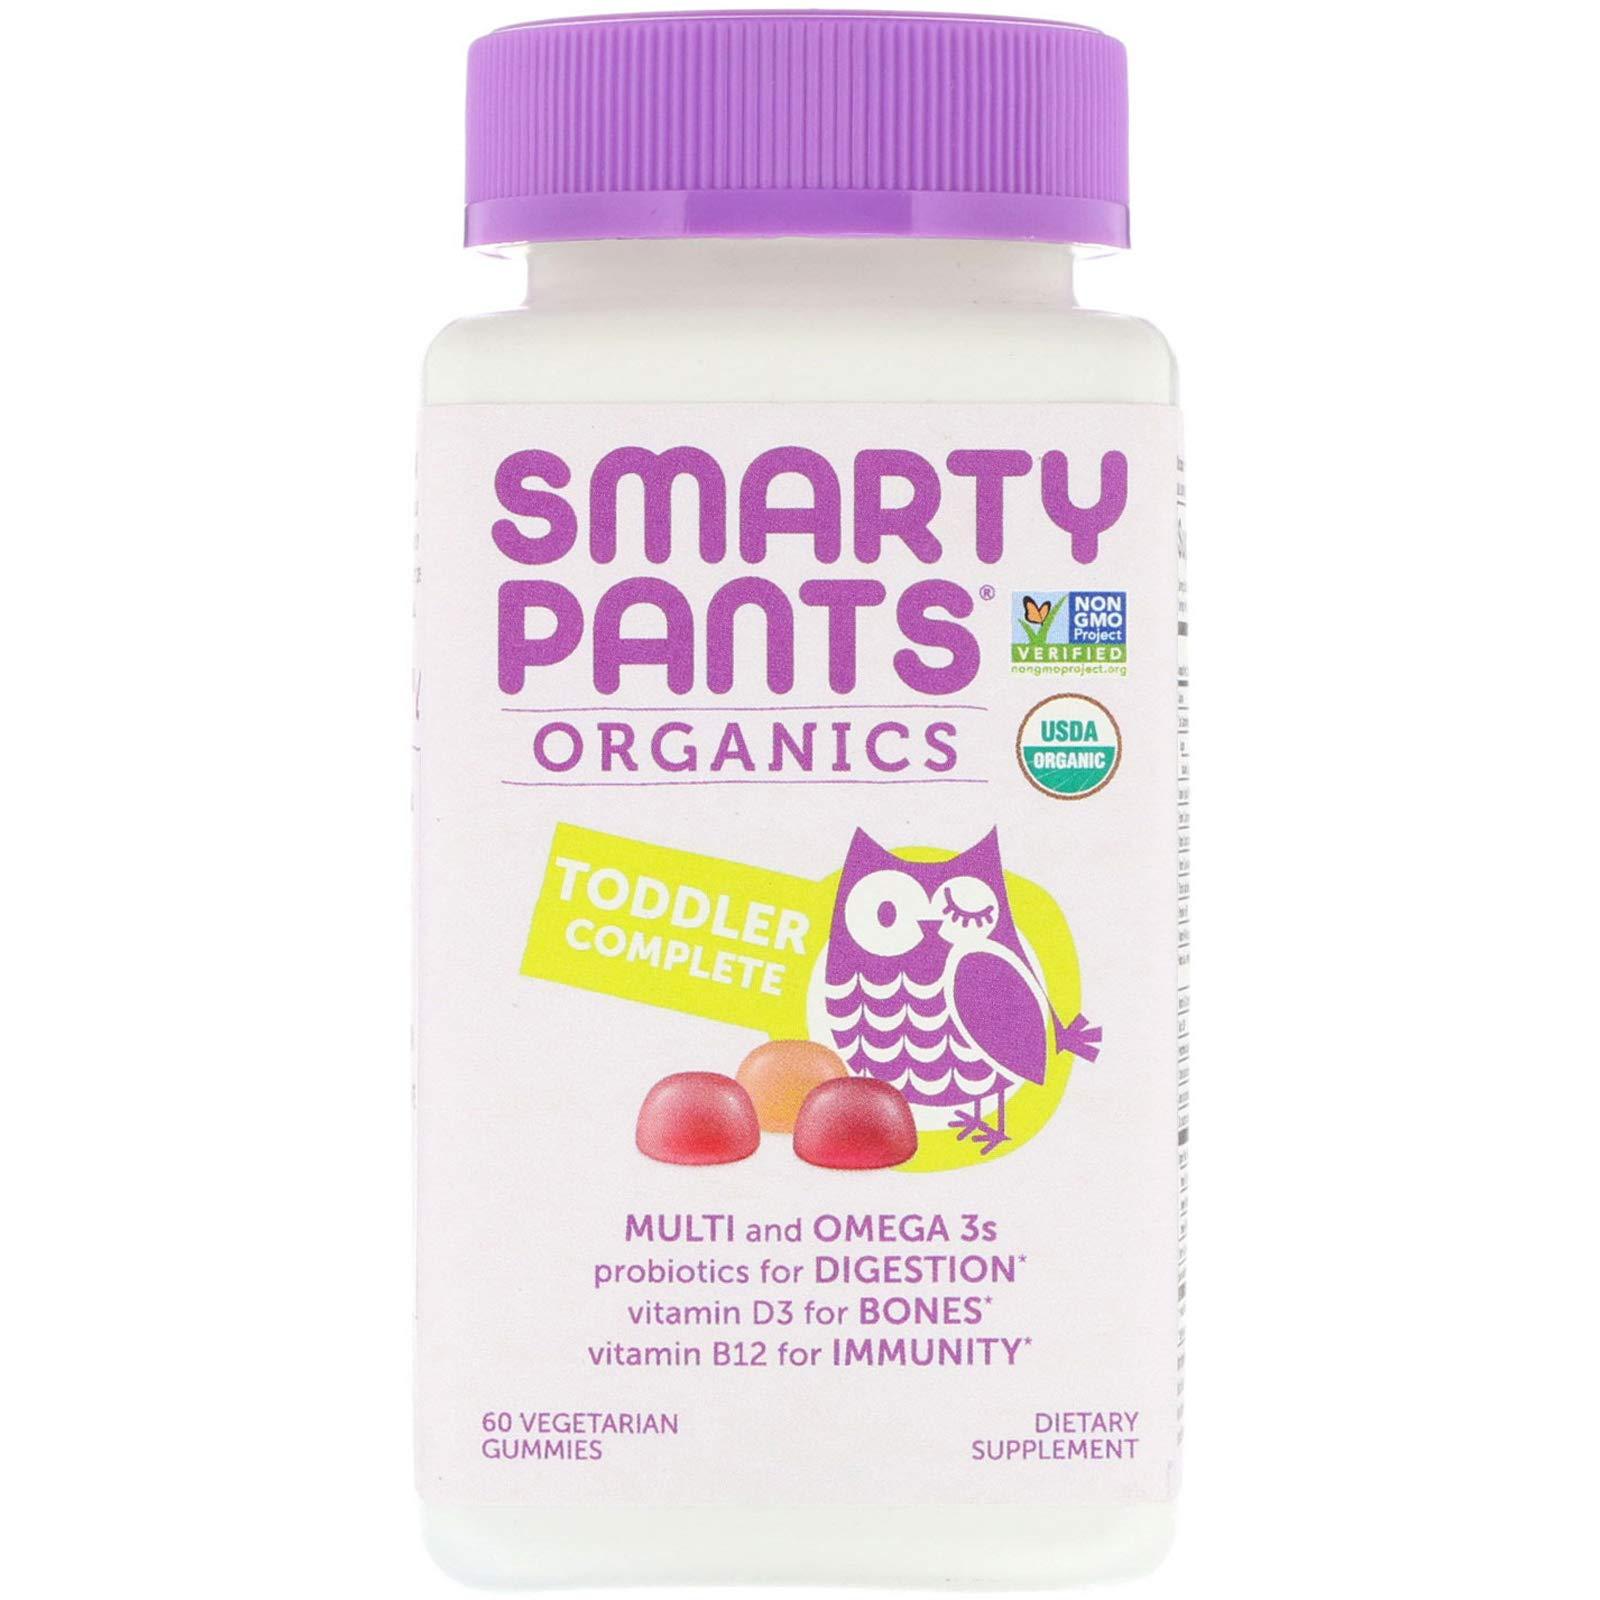 SmartyPants Vegetarian Organic Toddler Daily Gummy Vitamins: Multivitamins, Gluten Free, Non-GMO, Omega-3, Probiotic,* Vitamin D3, Methylcobalamin Vitamin B12, Zinc, 60 Count (30 Day Supply)